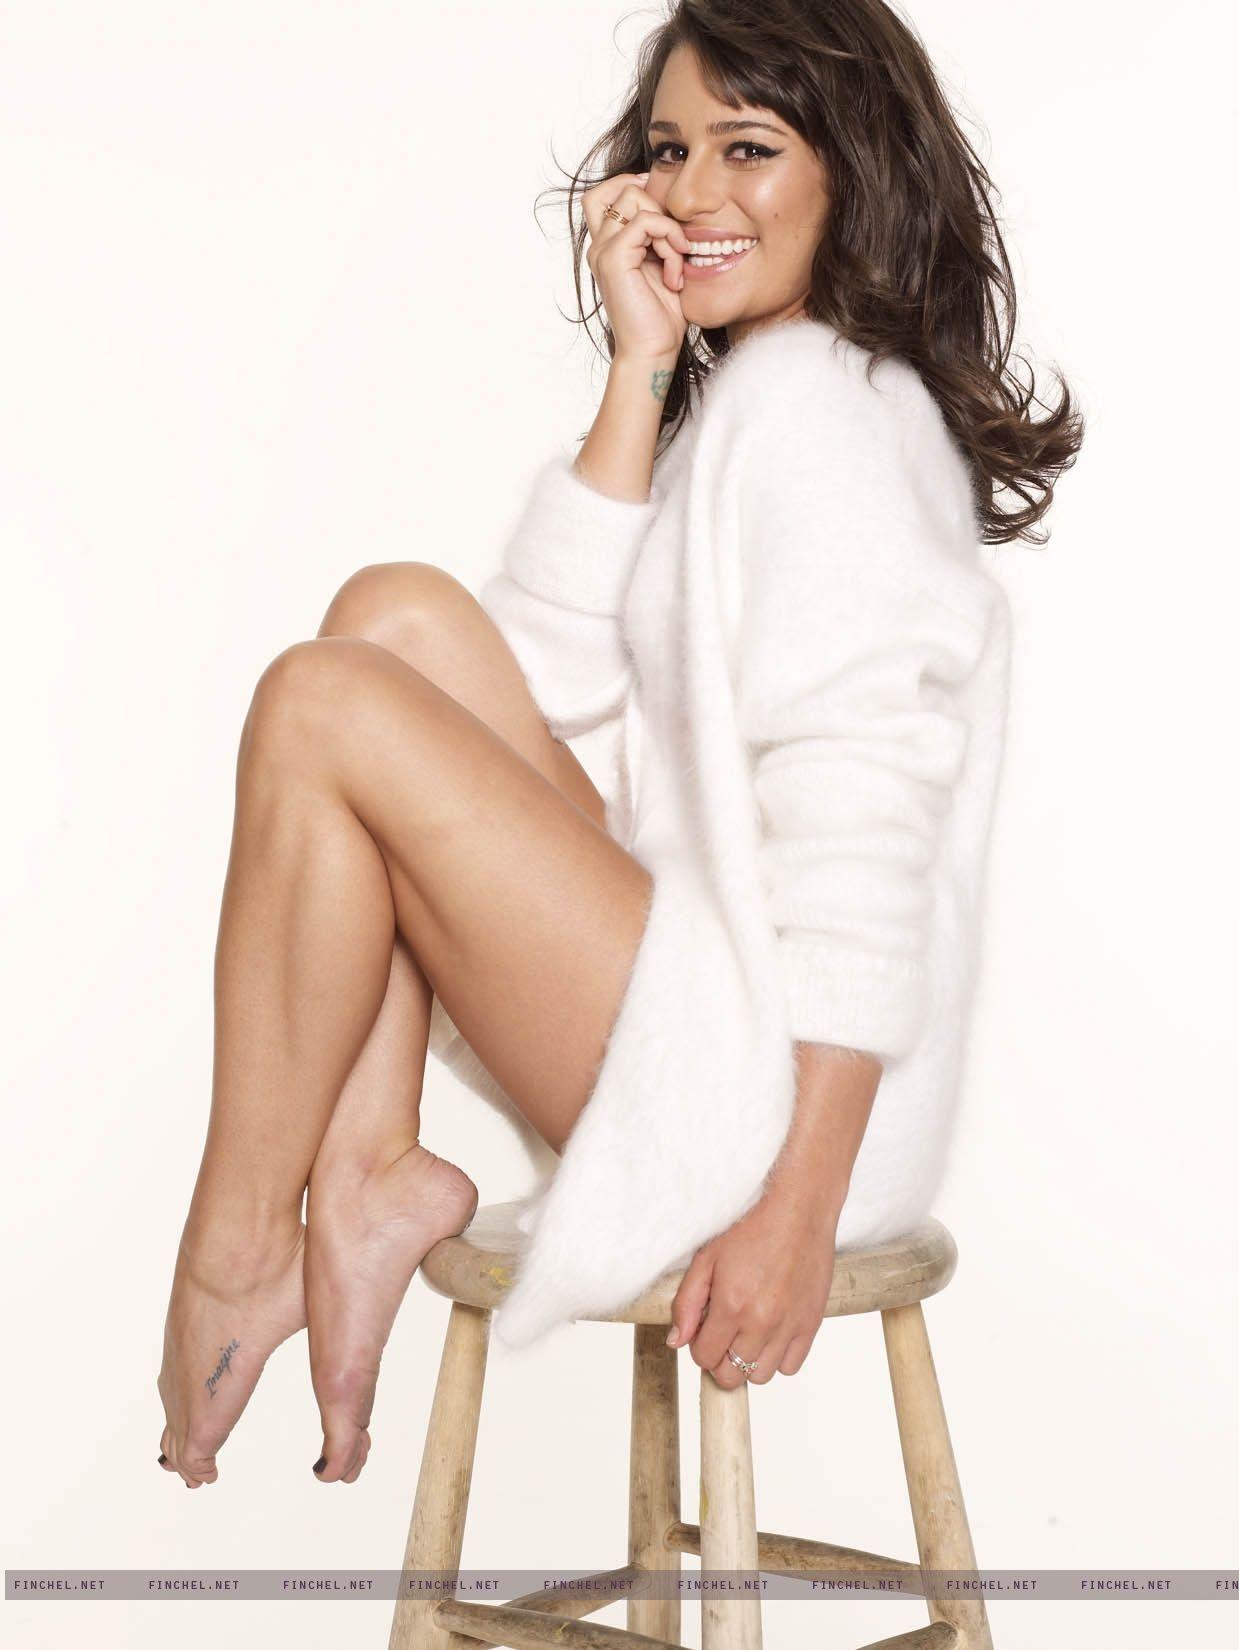 Feet Lea Michele nude photos 2019